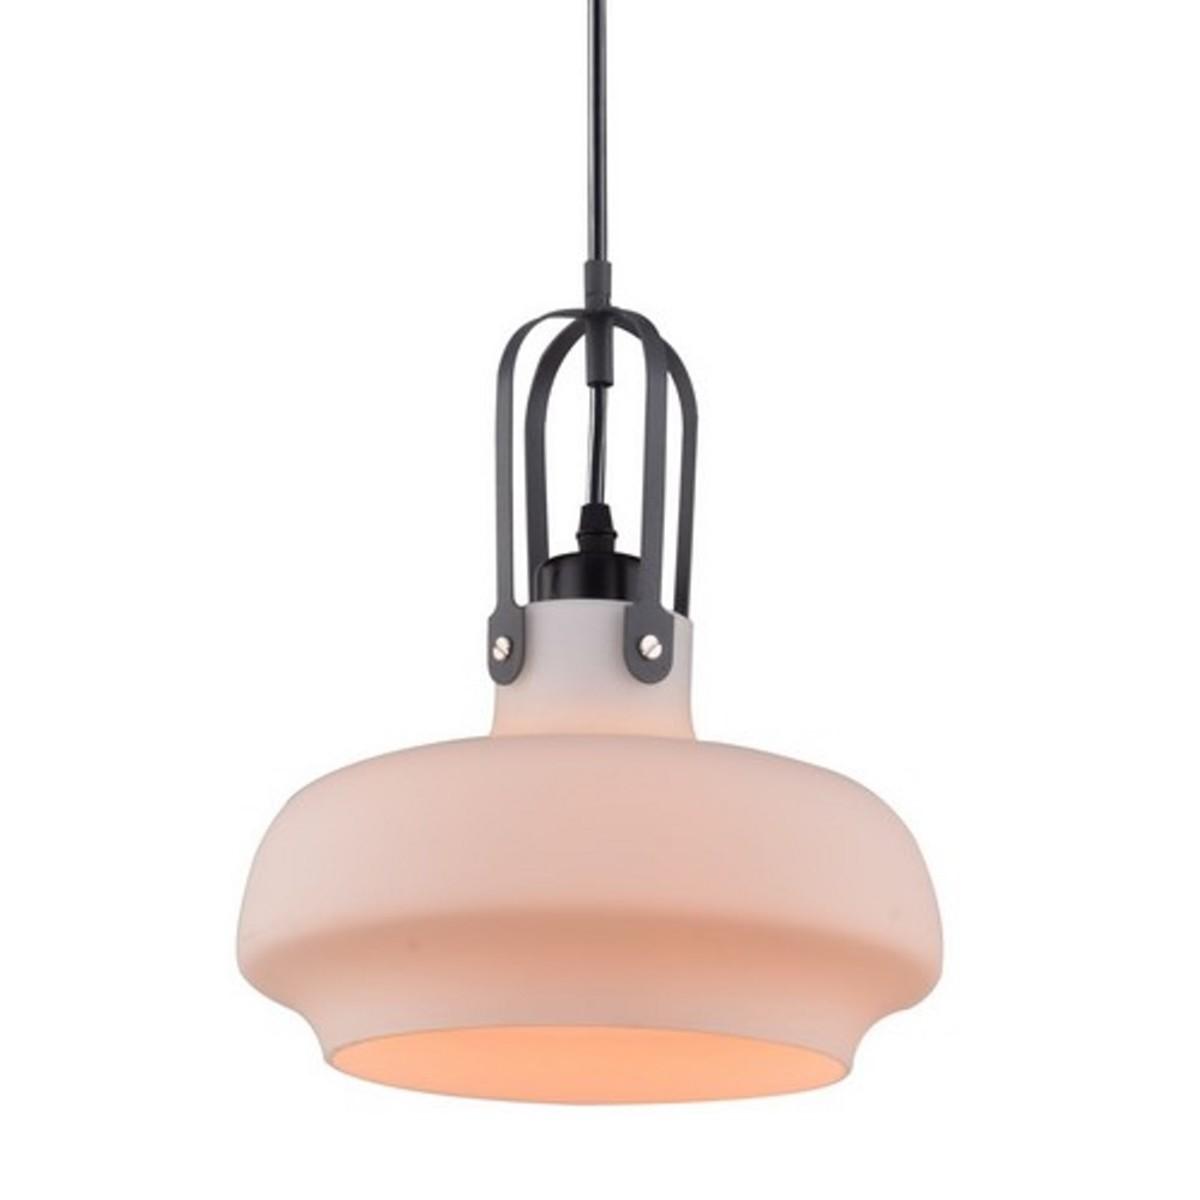 Люстра Arte Lamp Arno A3624SP-1WH E27 1 лампа